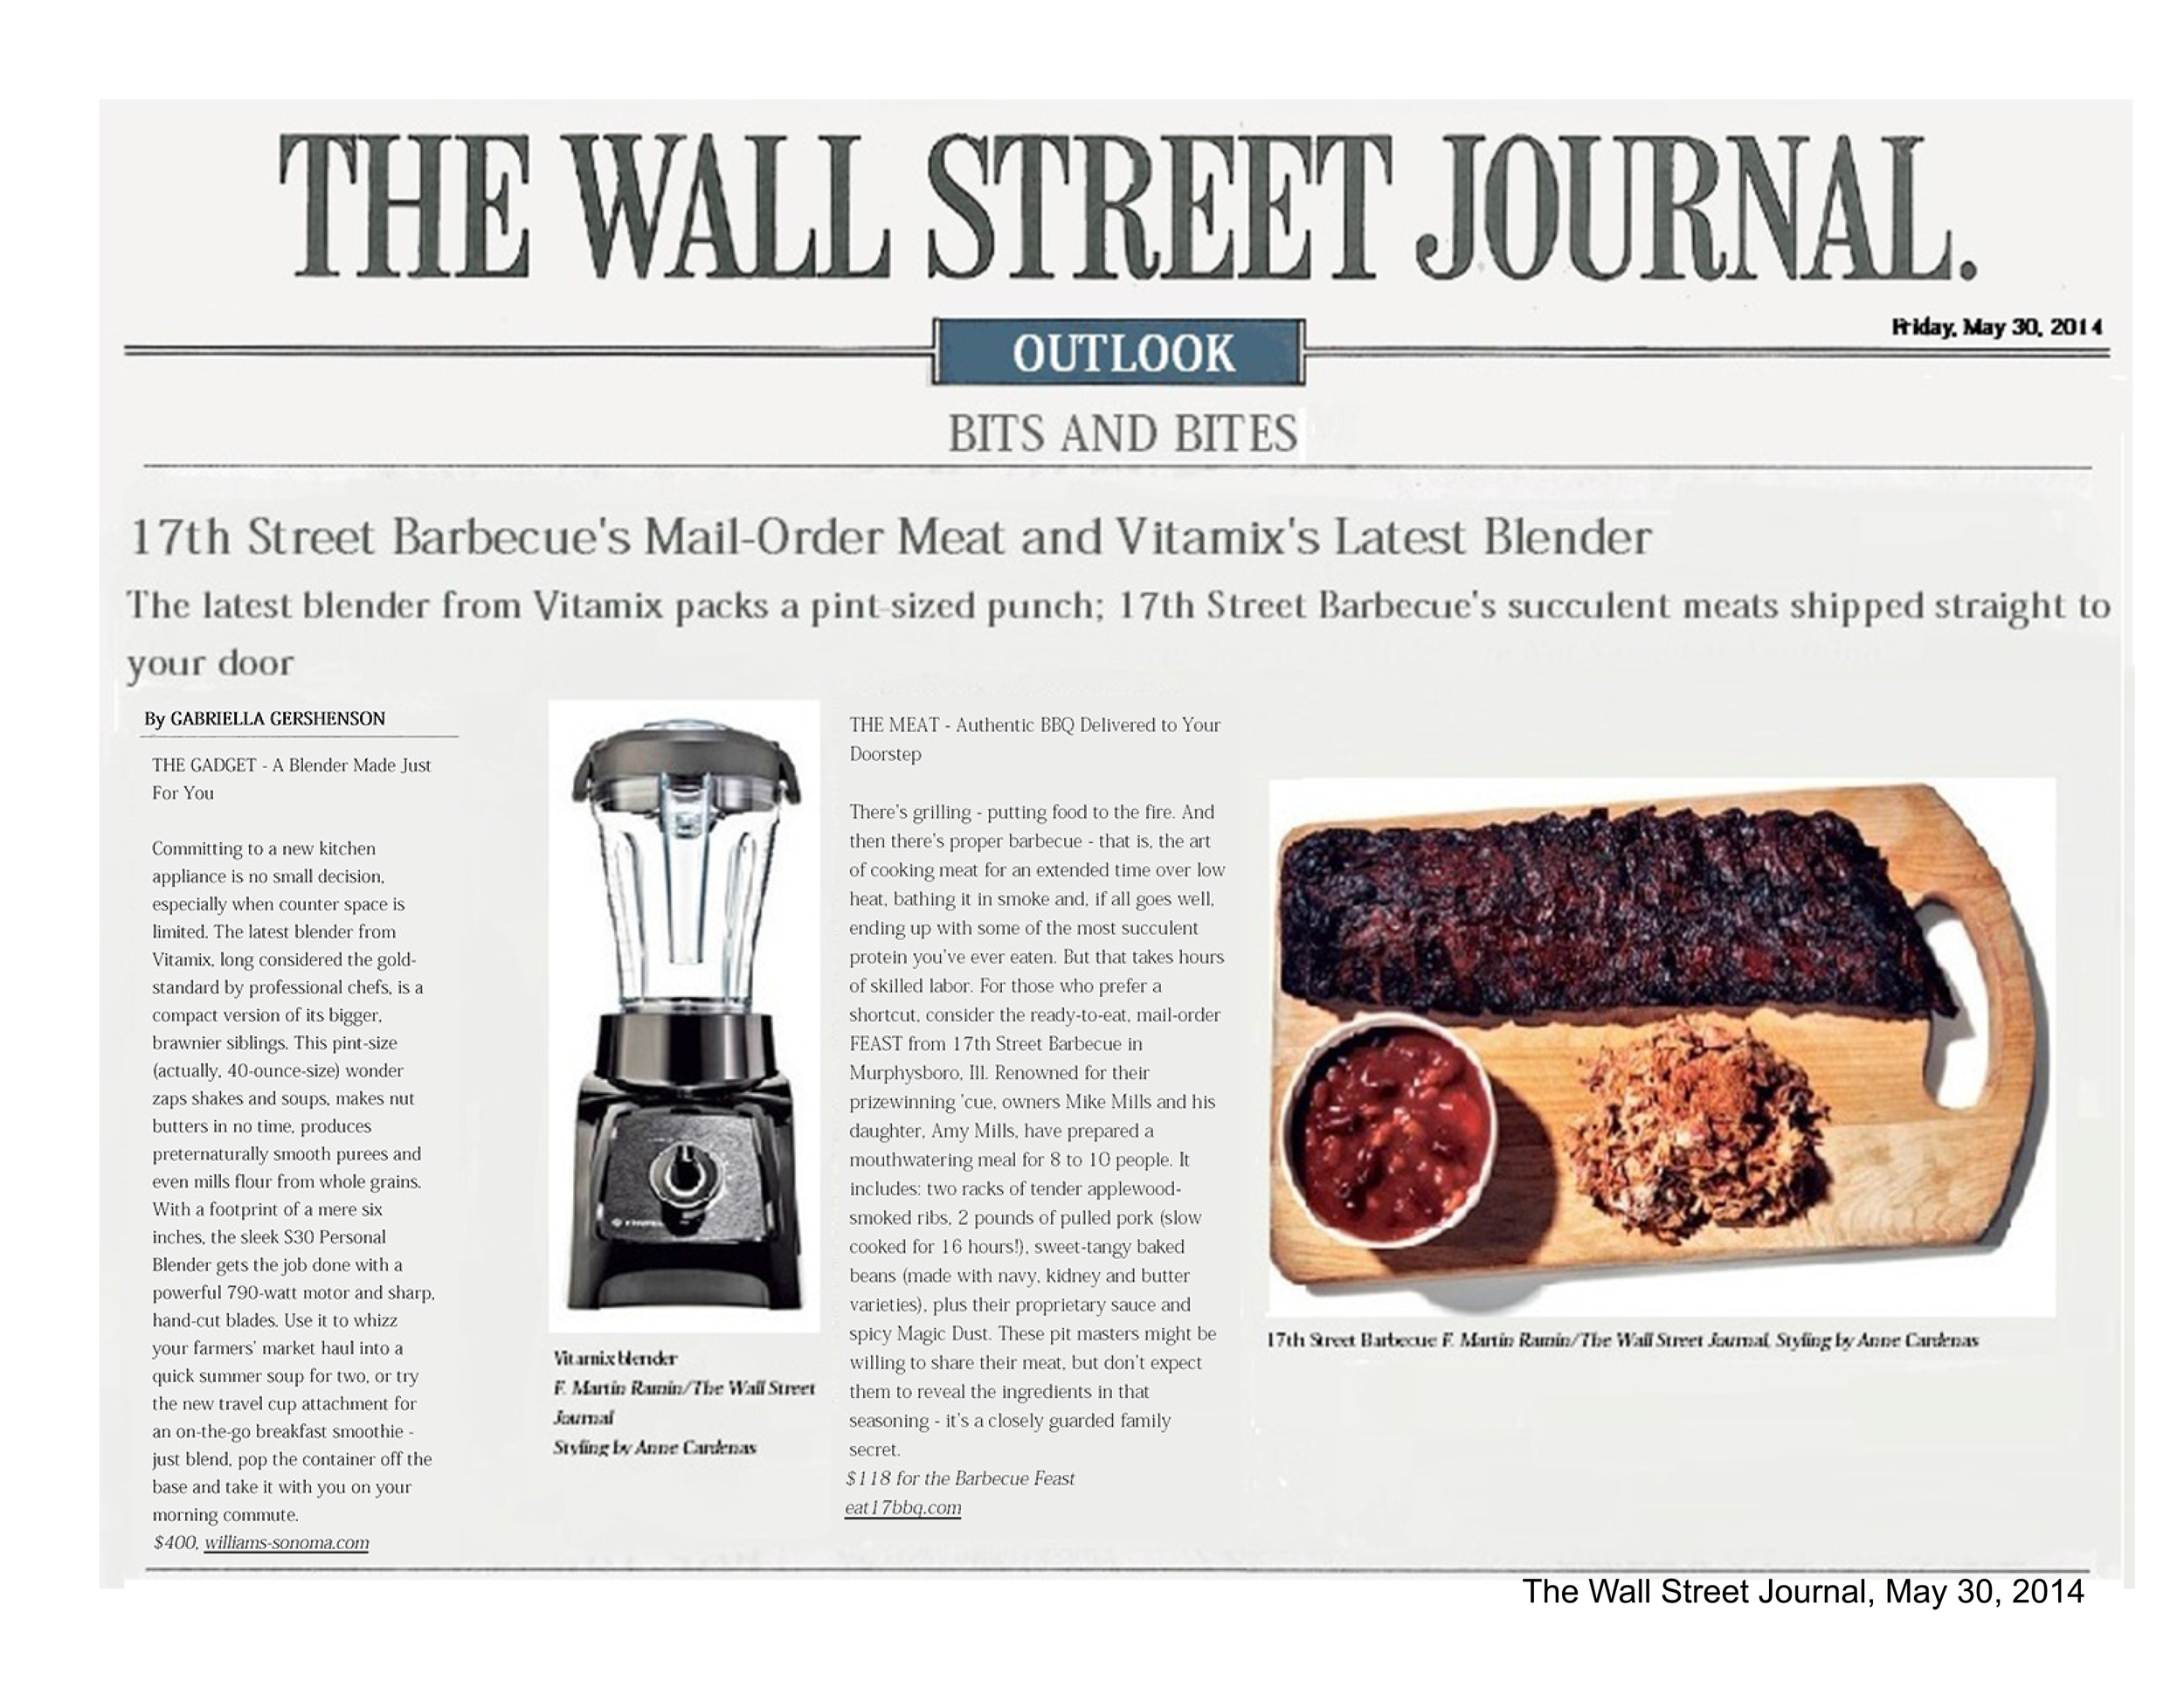 WallStreetJournal2014_0530.jpg